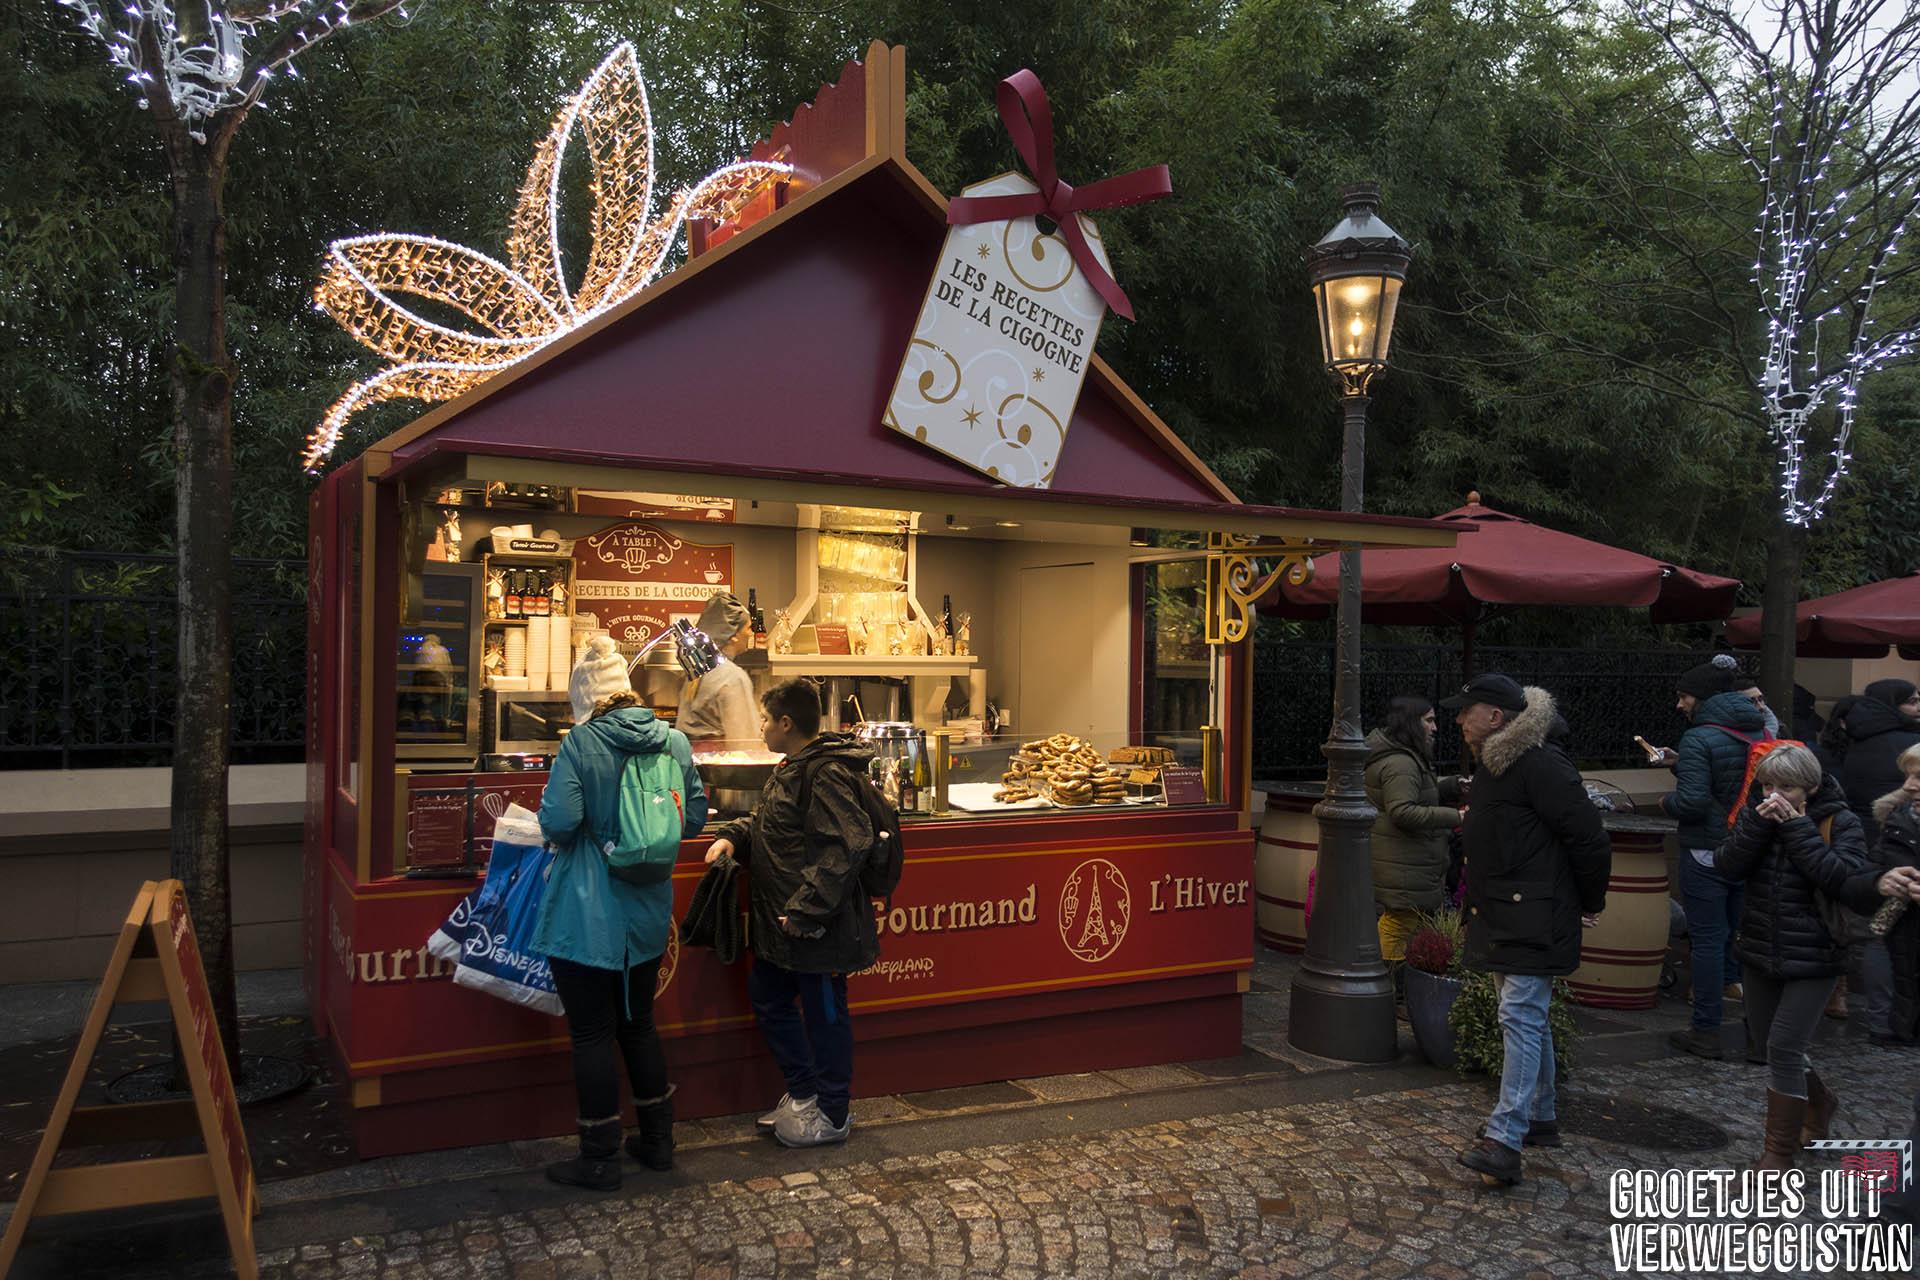 Kraampje van L'Hiver Gourmand, foodfestival in Walt Disney Studios in Parijs